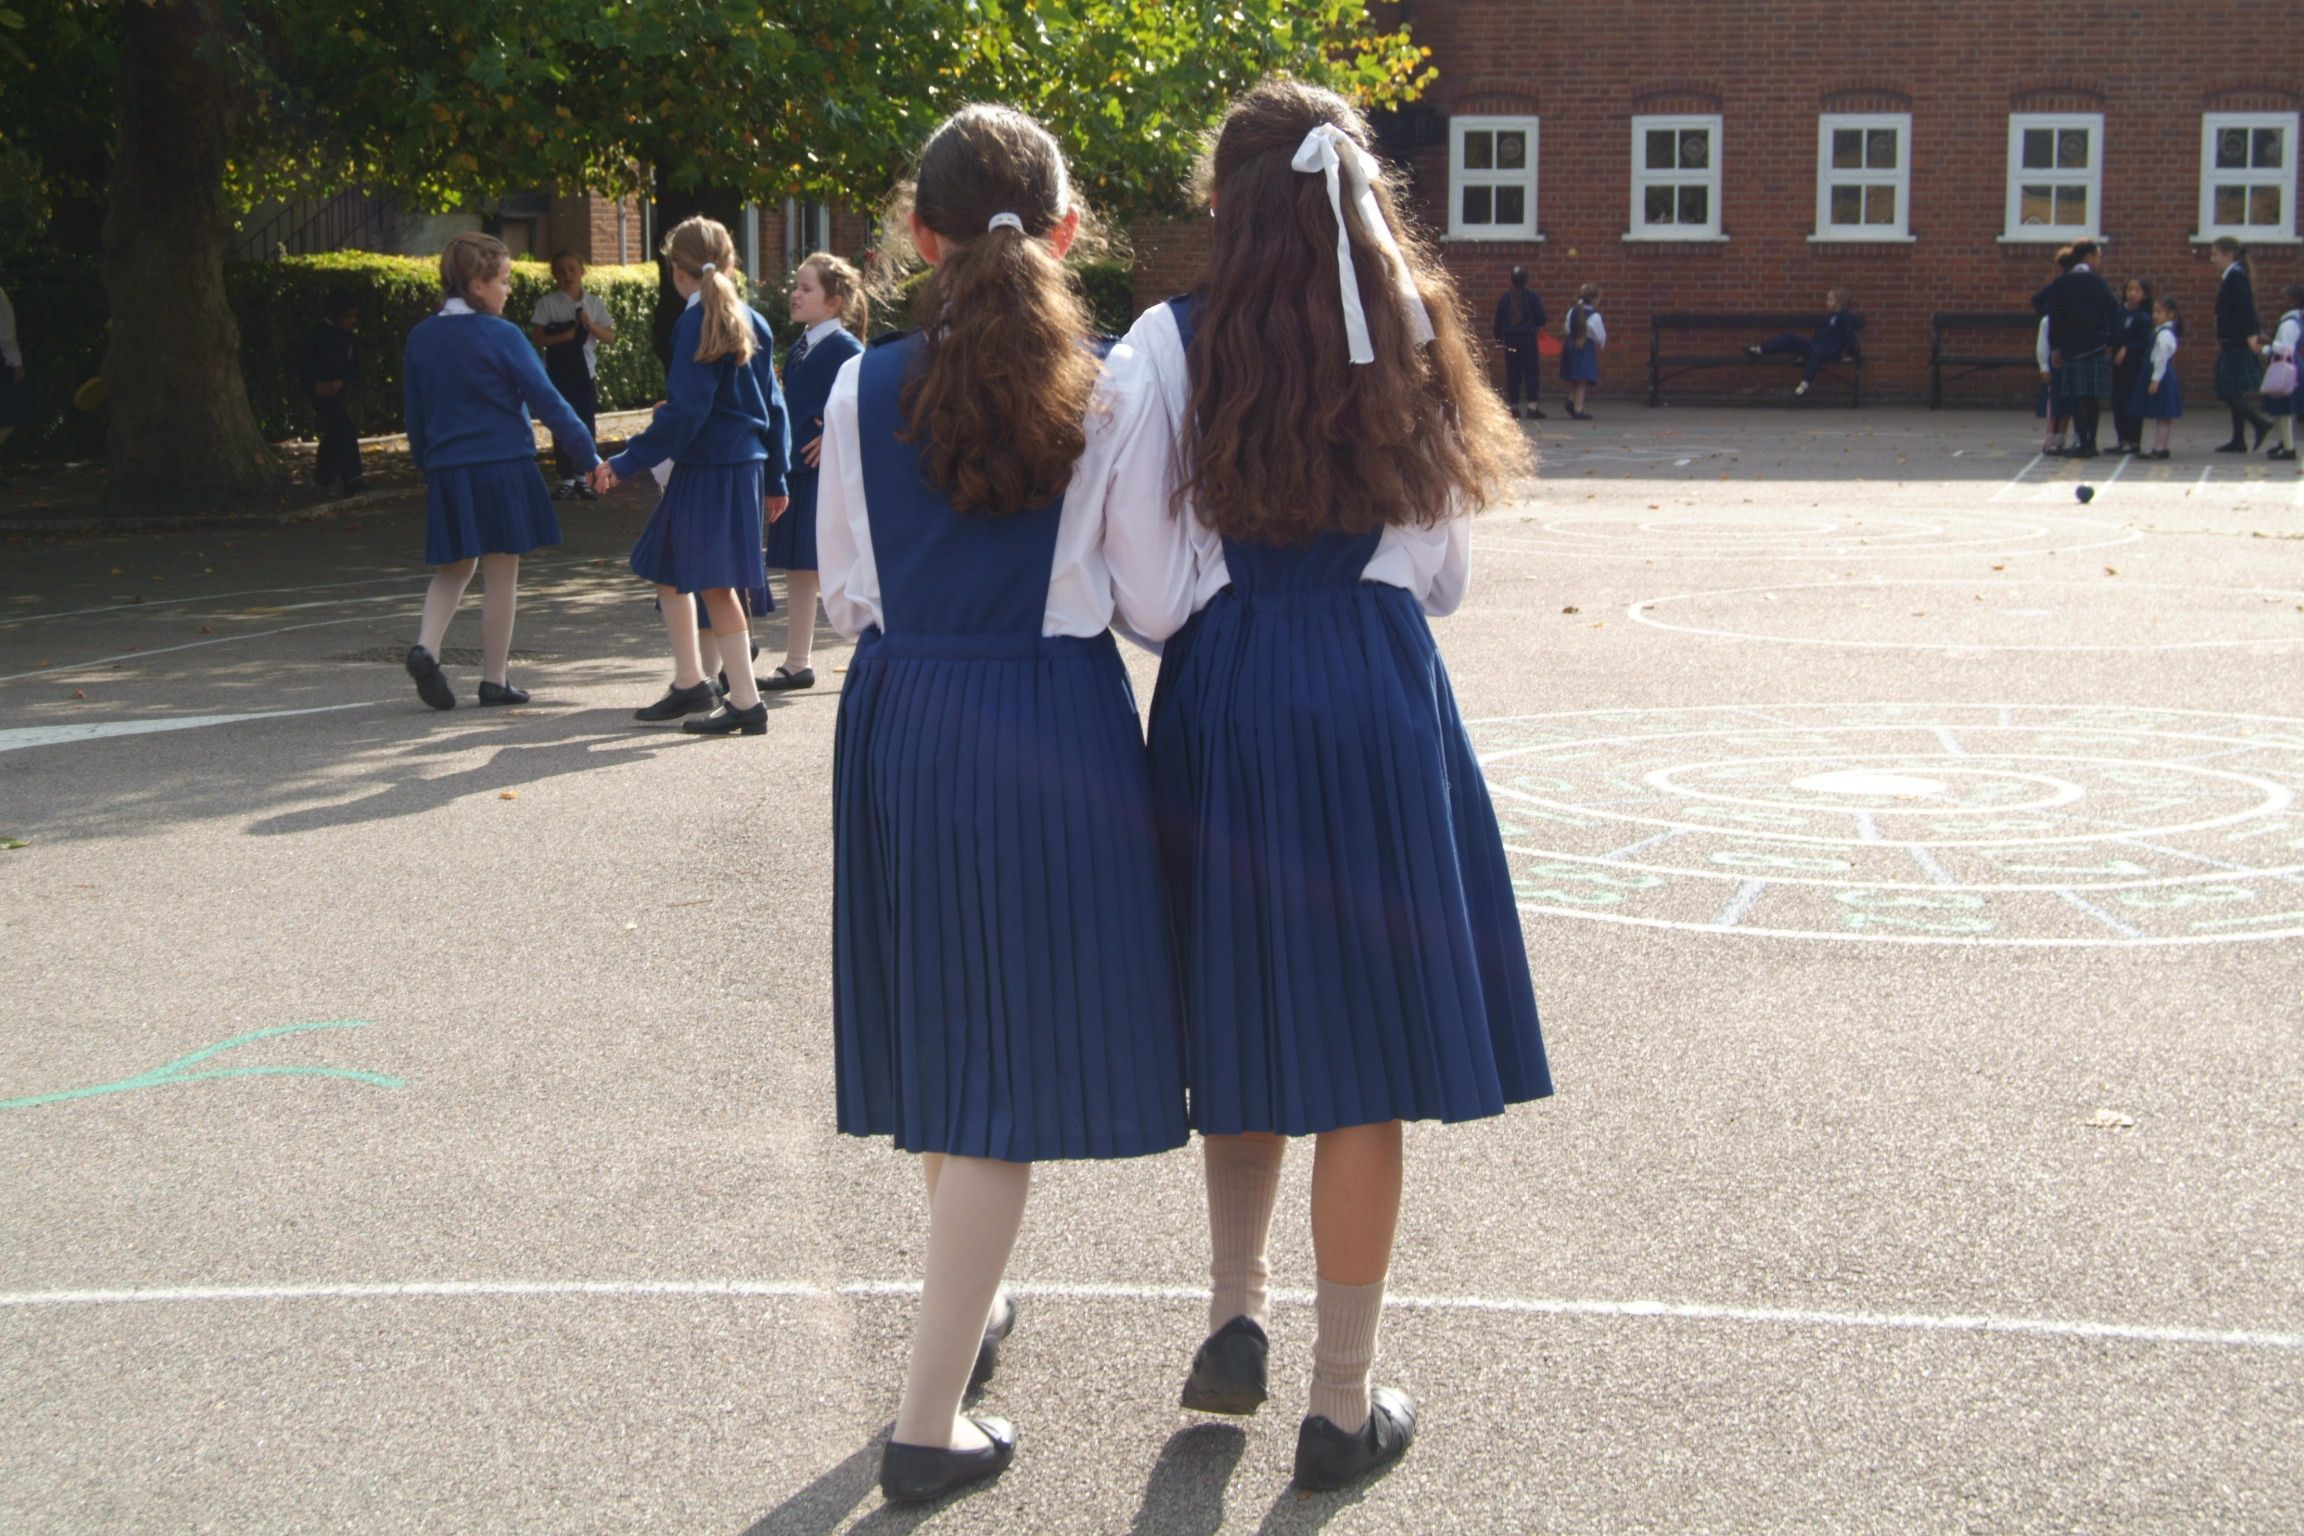 Uniforms in School : School Uniforms In York